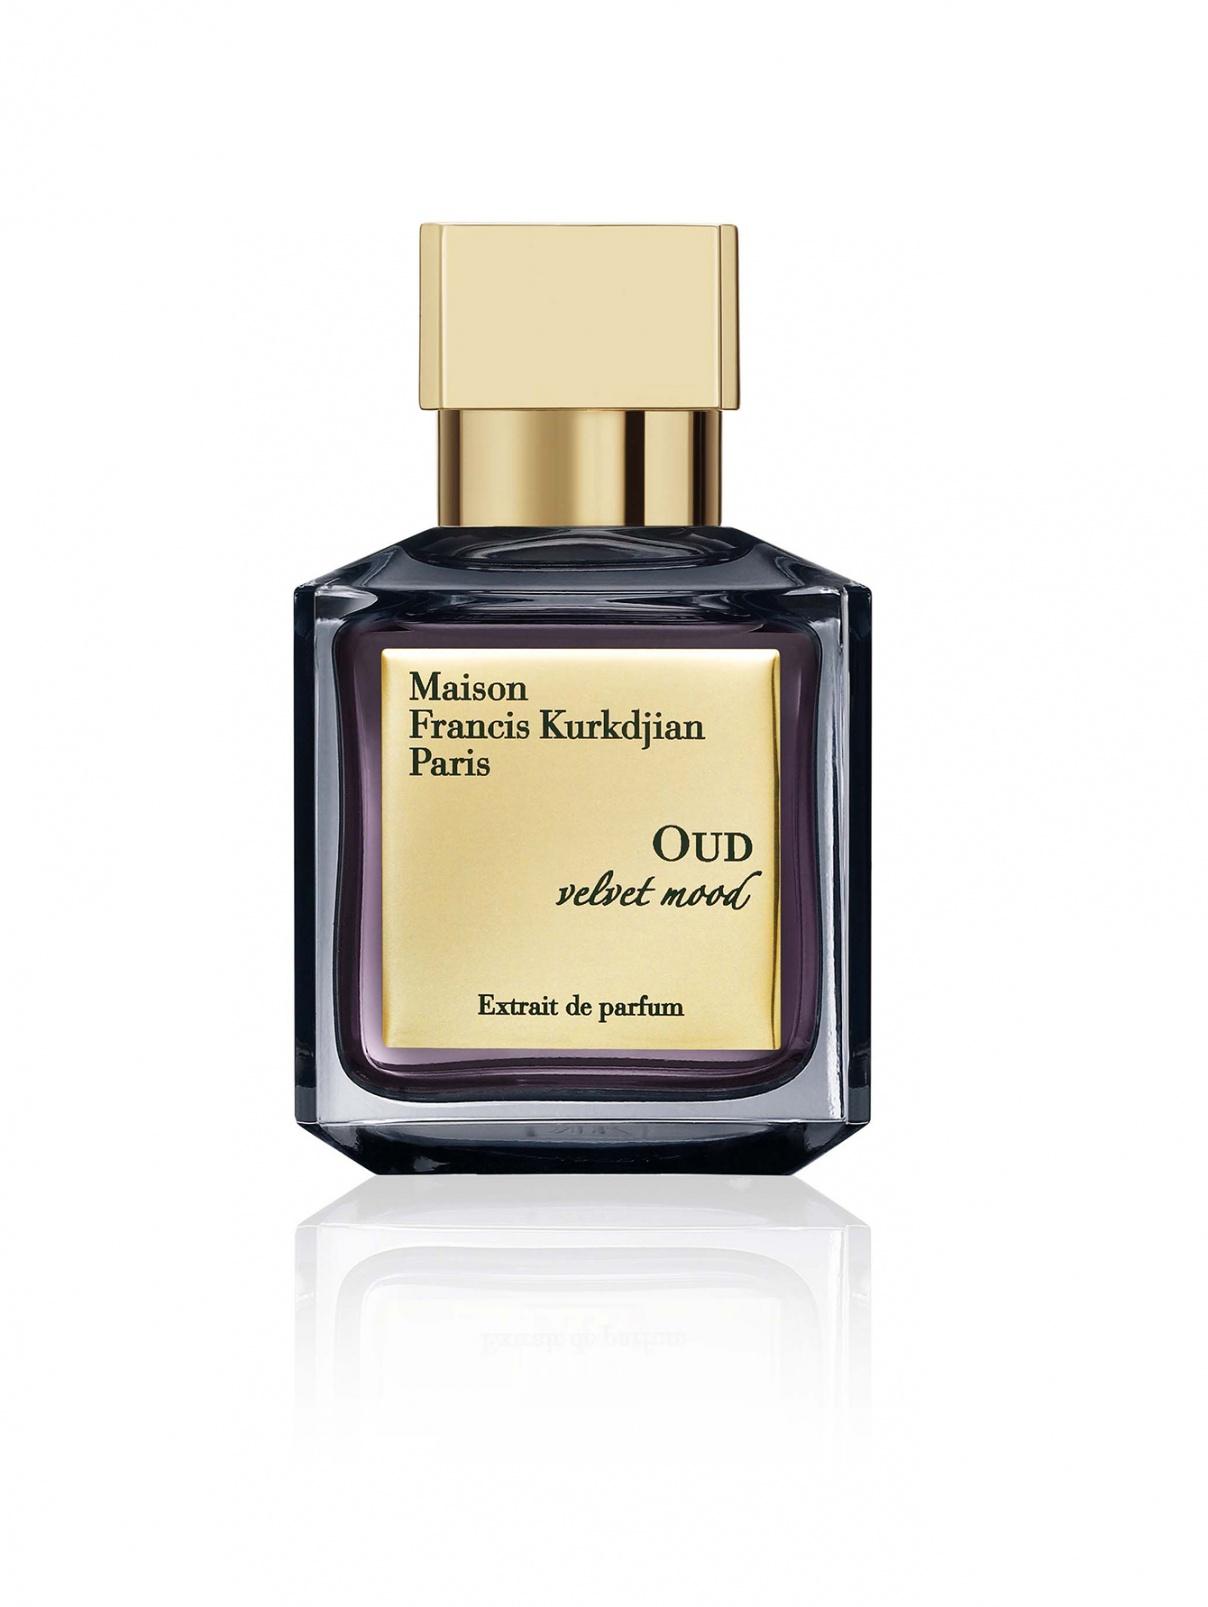 Парфюмерная вода - Velvet mood, Oud, 70ml Maison Francis Kurkdjian  –  Общий вид